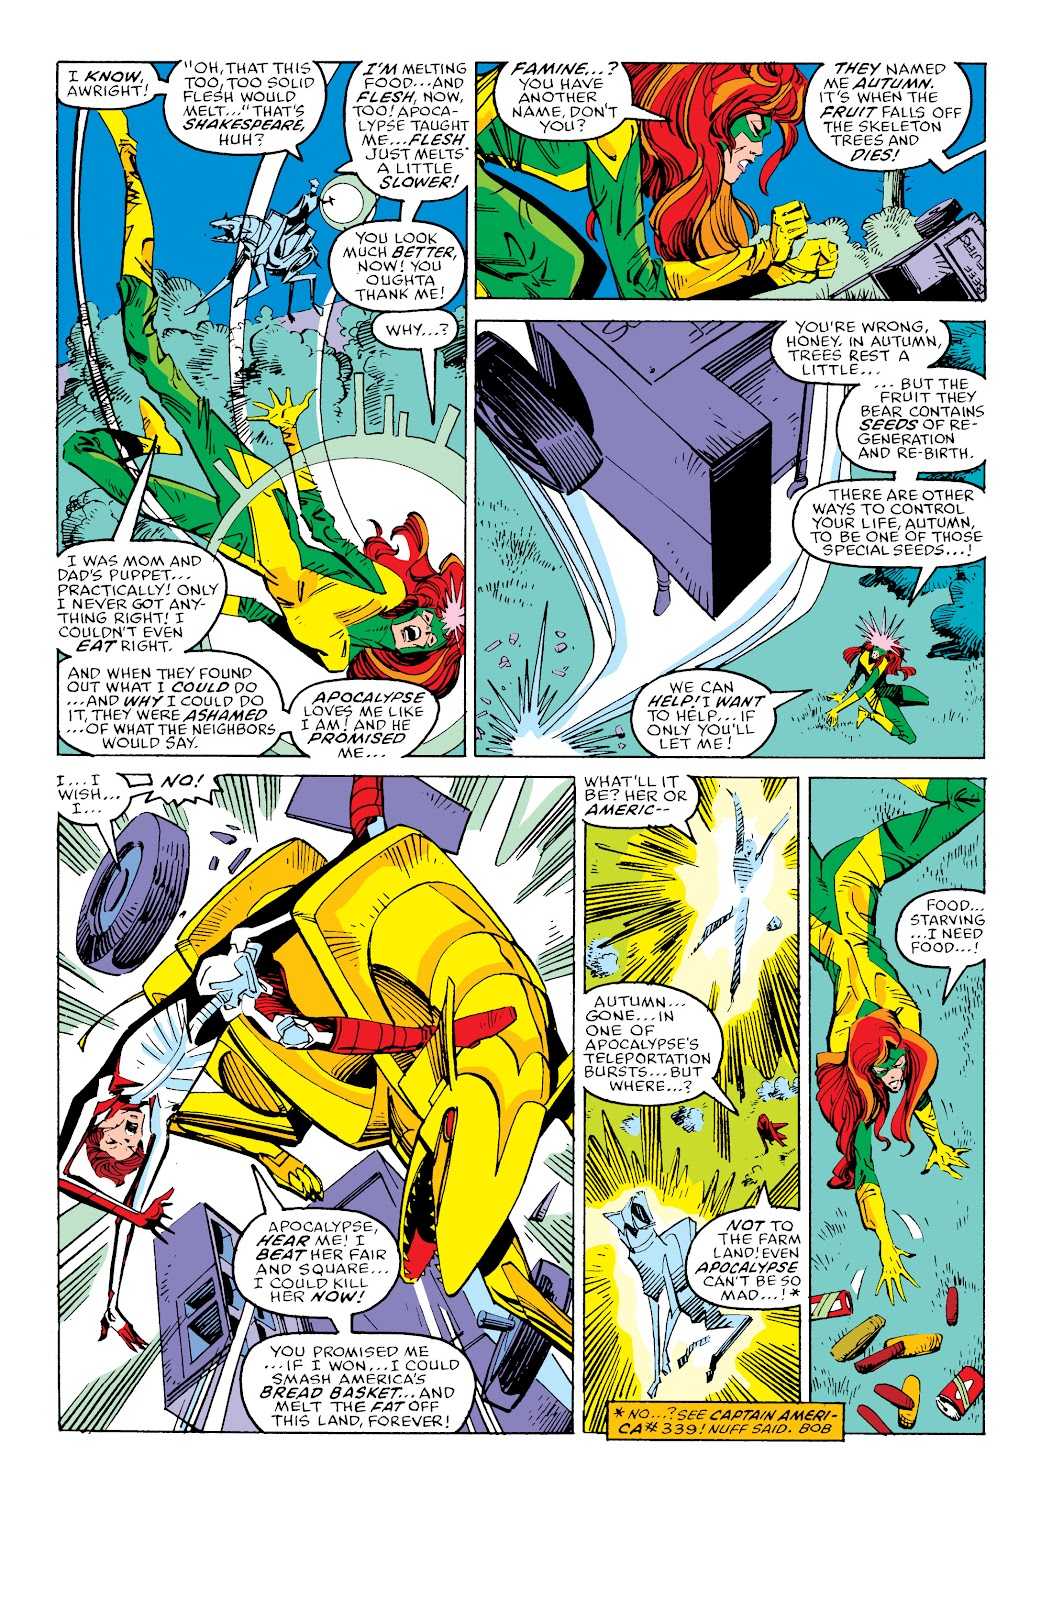 Read online X-Men Milestones: Fall of the Mutants comic -  Issue # TPB (Part 3) - 15